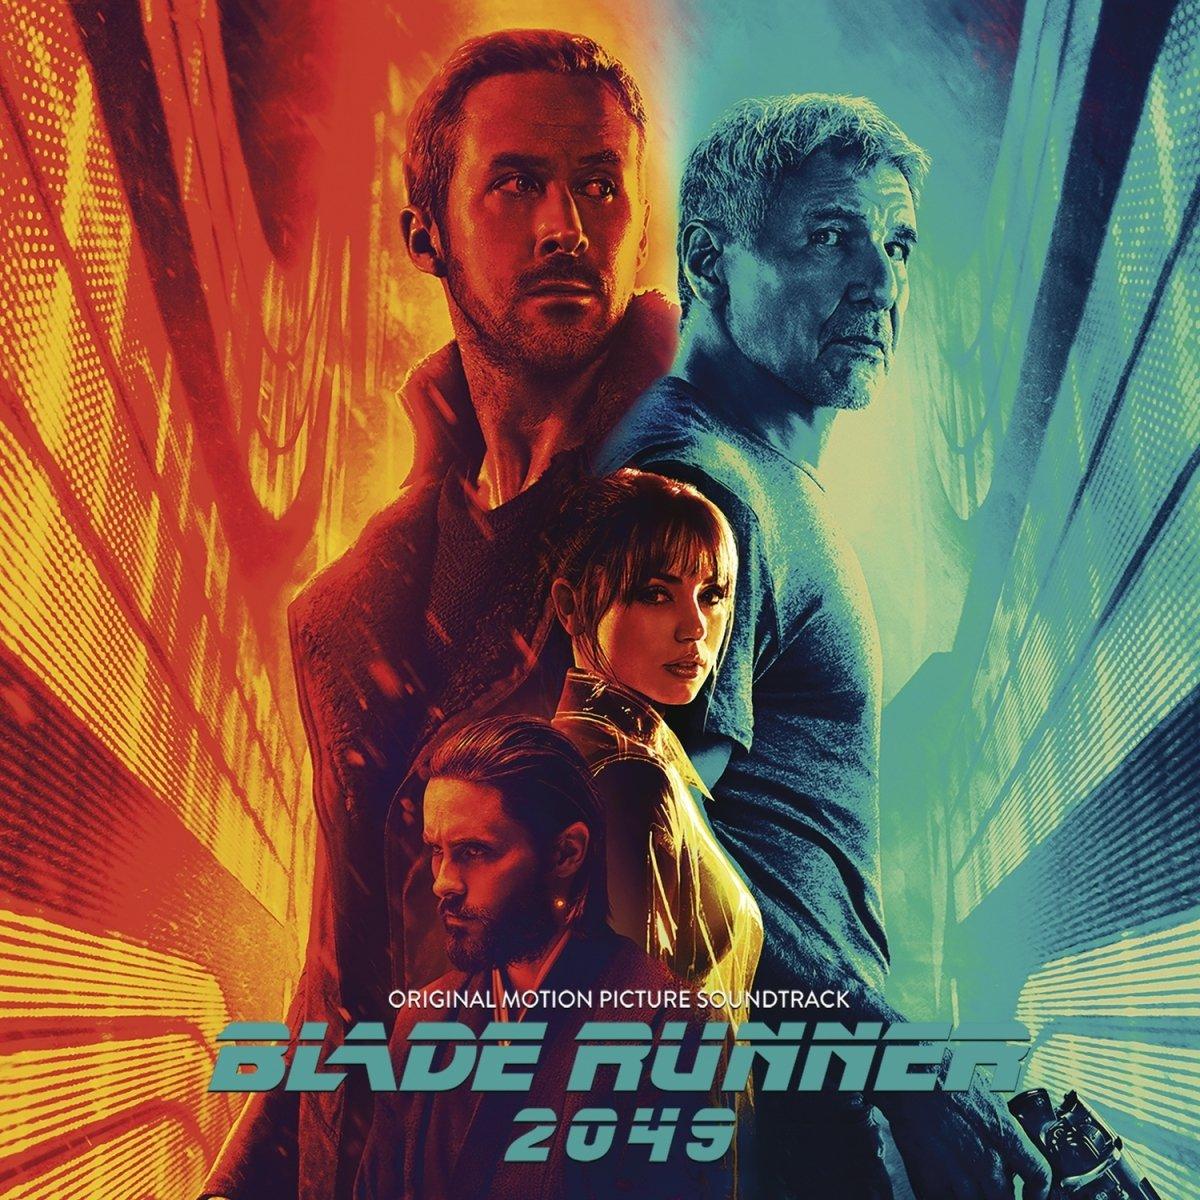 Blade Runner 2049 (Original Motion Picture Soundtrack) Double LP [VINYL] £15.99 (+£2.99 Non Prime) @ Amazon